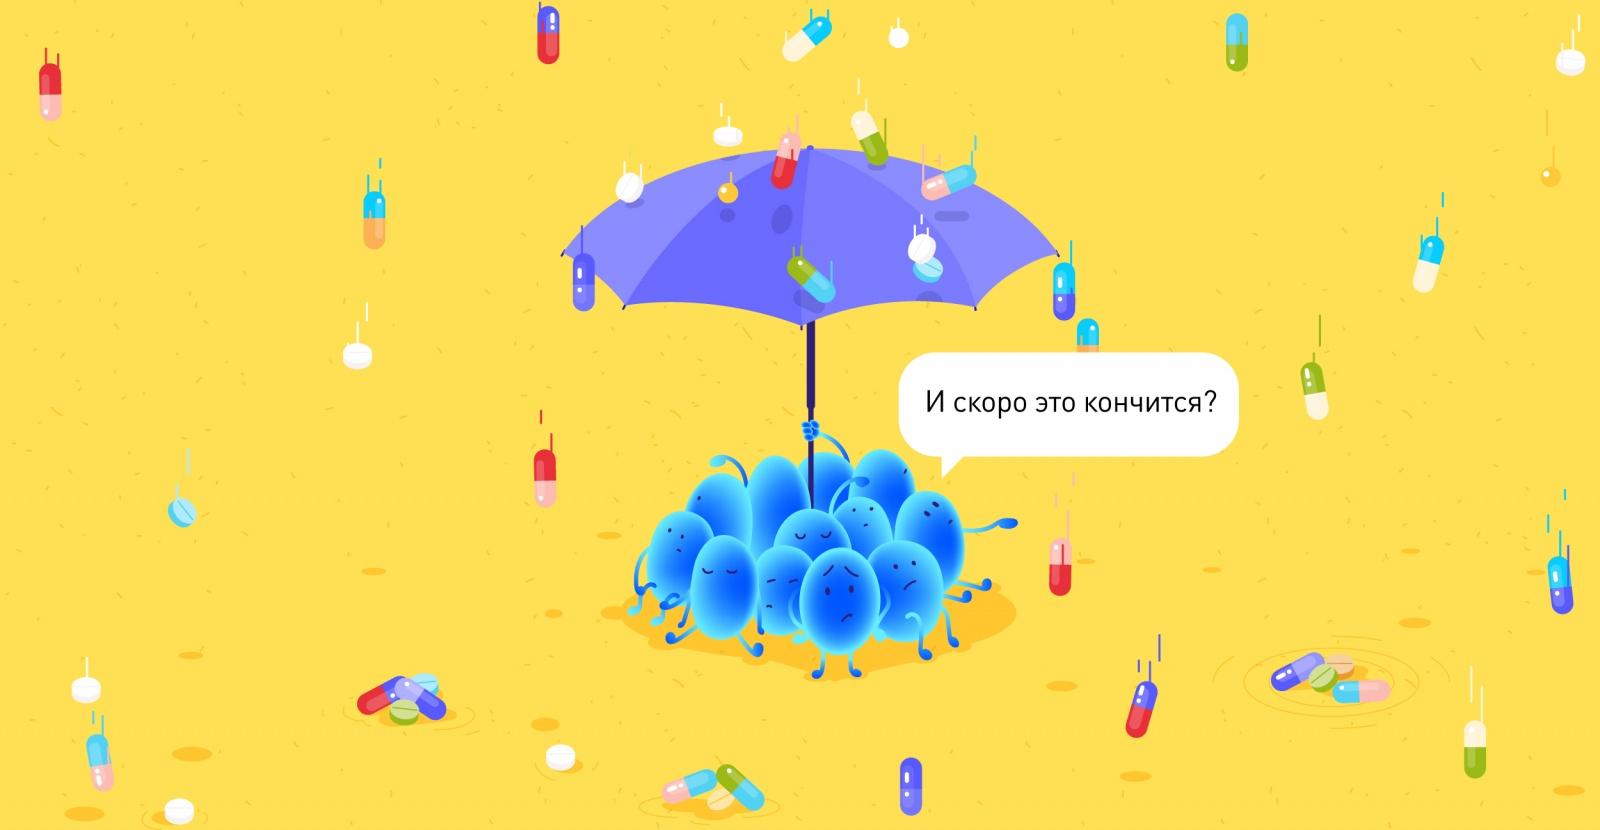 Микробиота. Как лекарства влияют на состав бактерий кишечника - 1